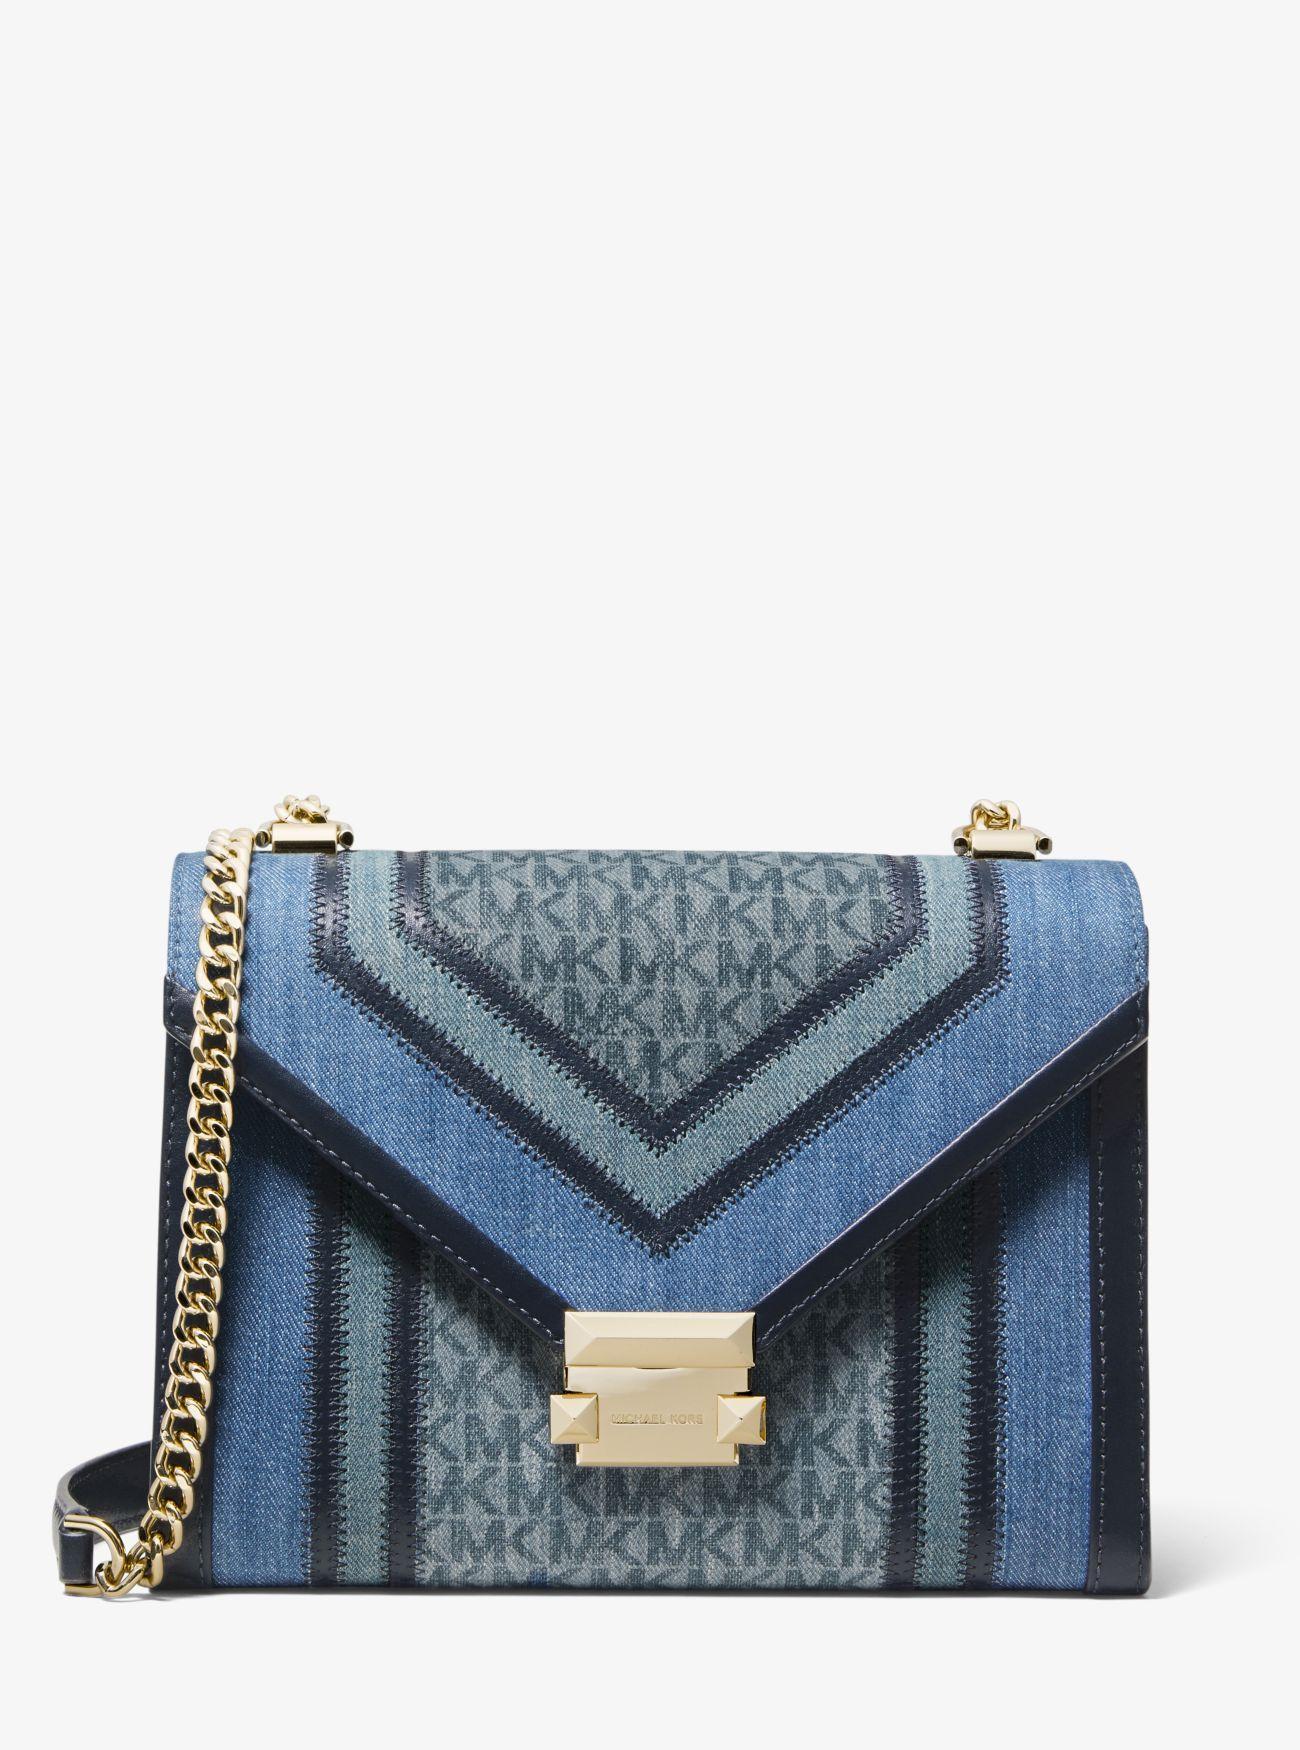 15630e14f0e3 Michael Kors. Women s Blue Whitney Large Denim Logo Convertible Shoulder Bag